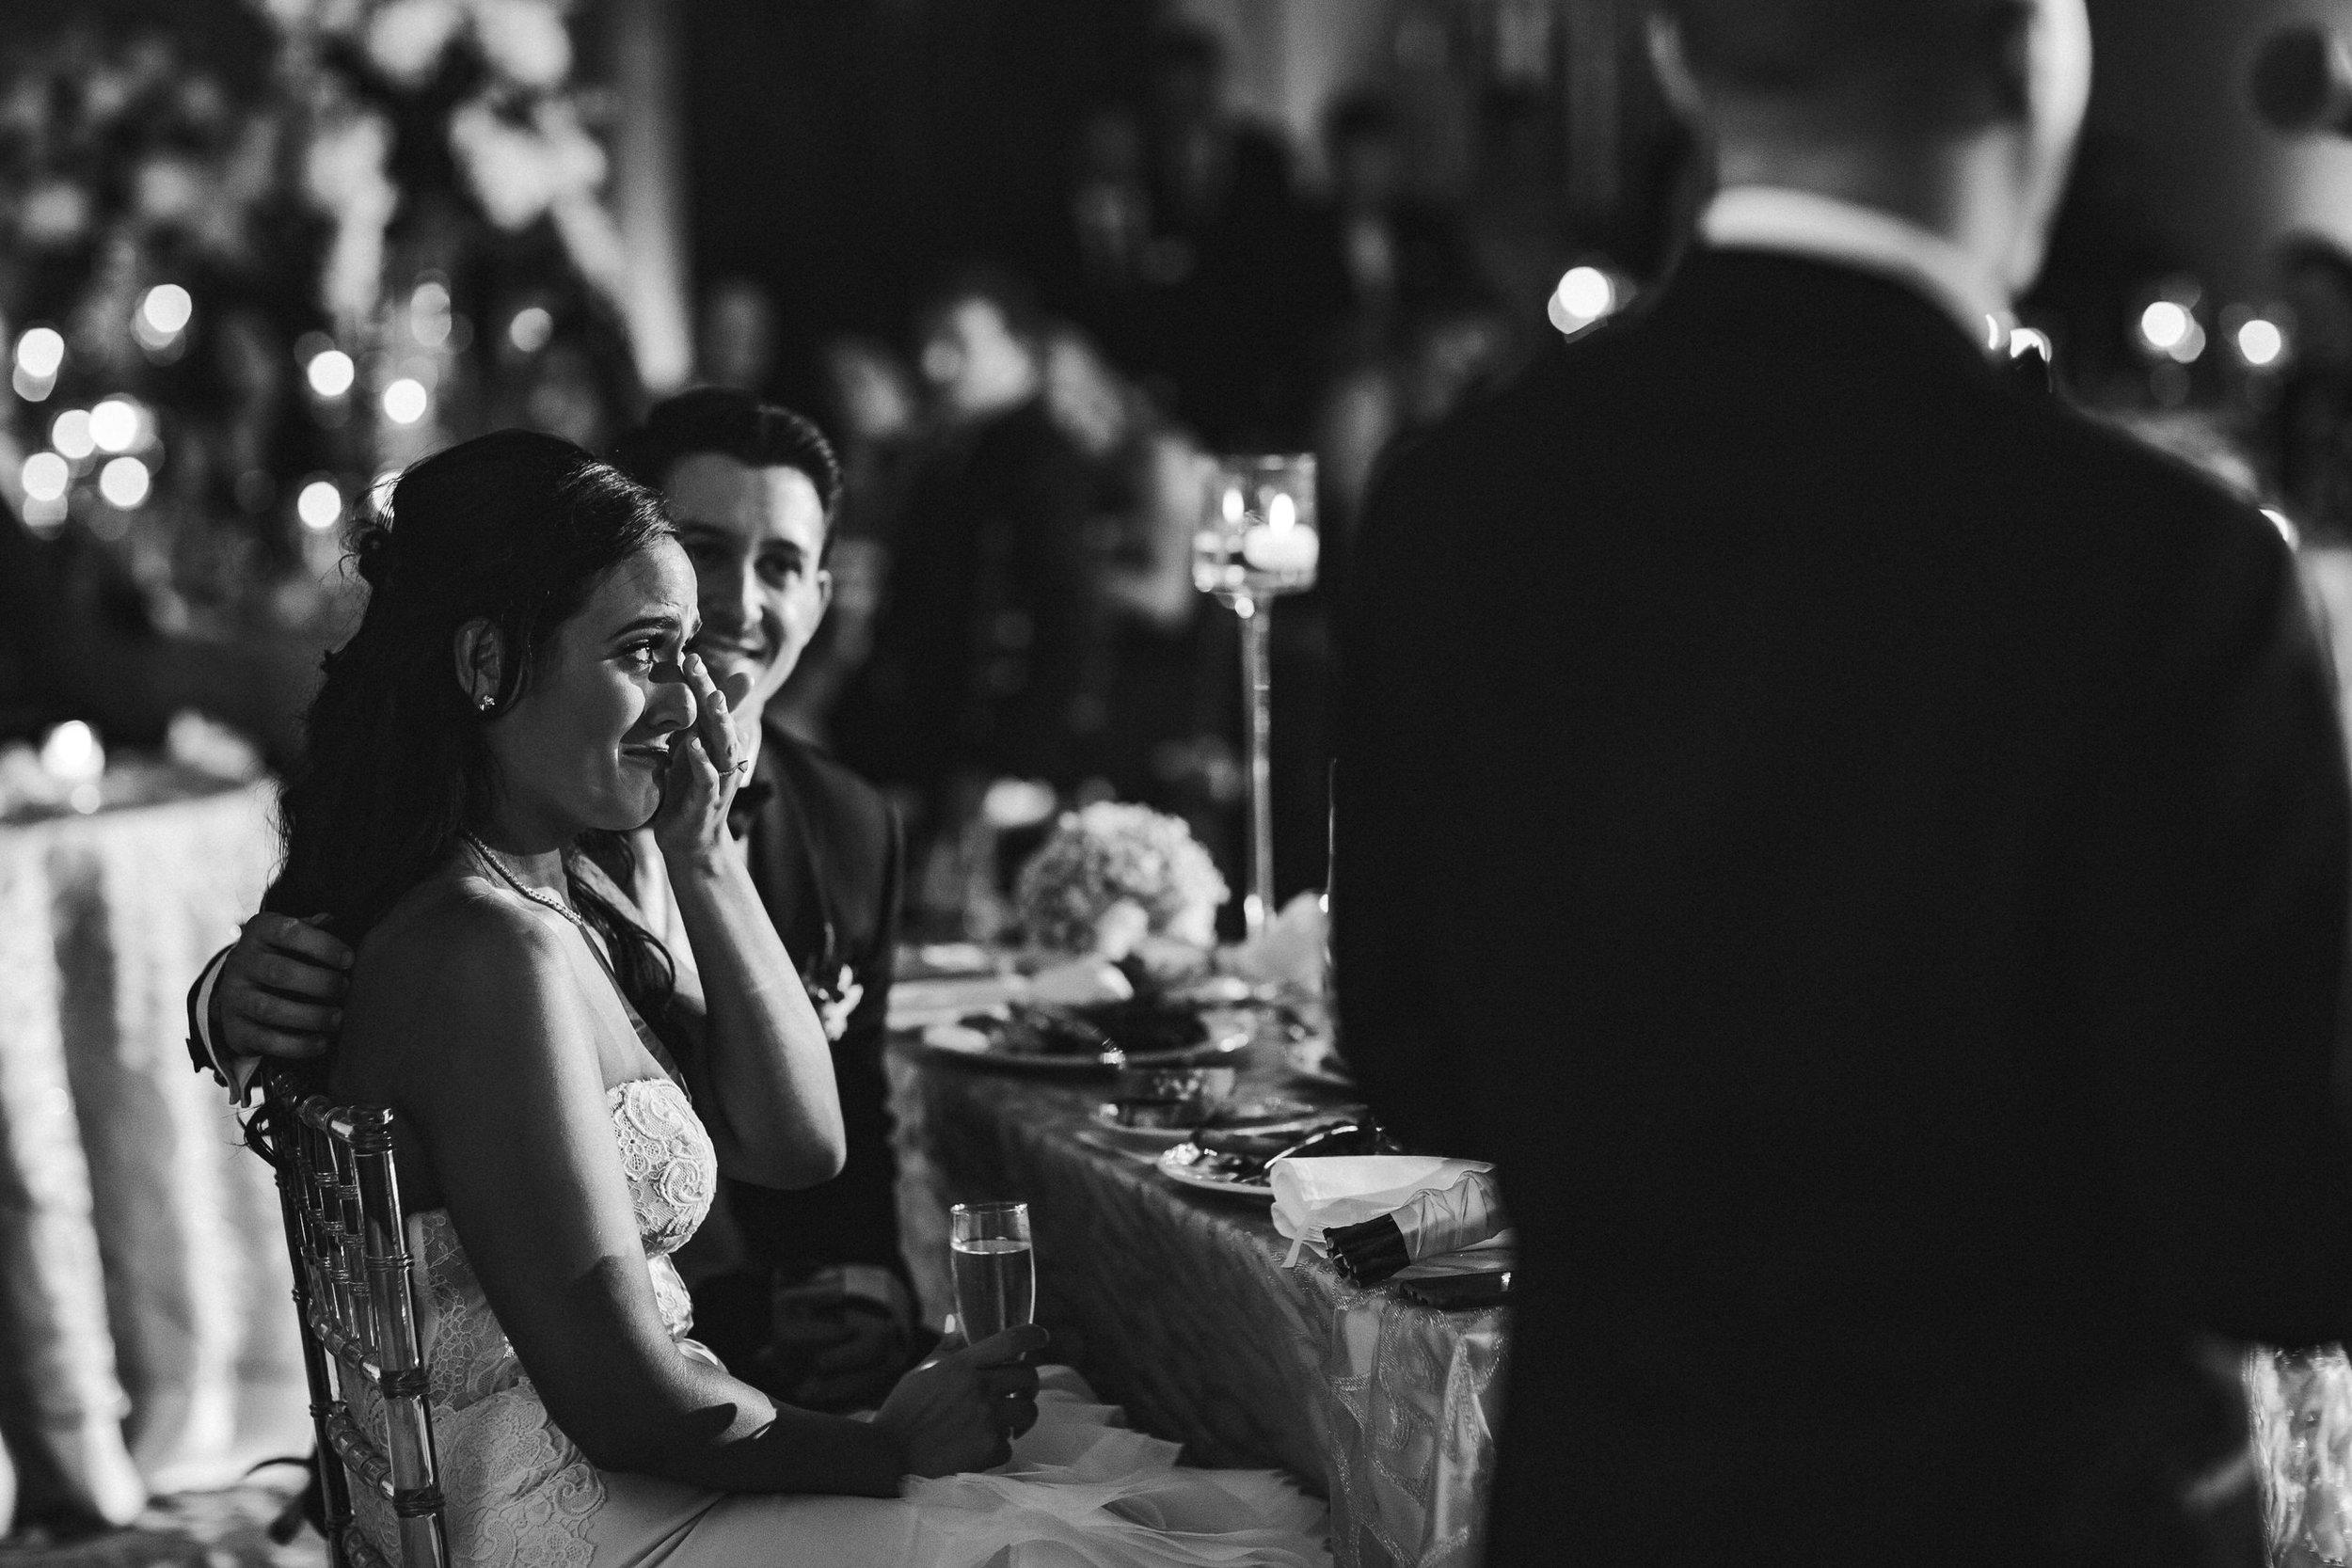 miami-biltmore-wedding-photographer-reception-party-21.jpg